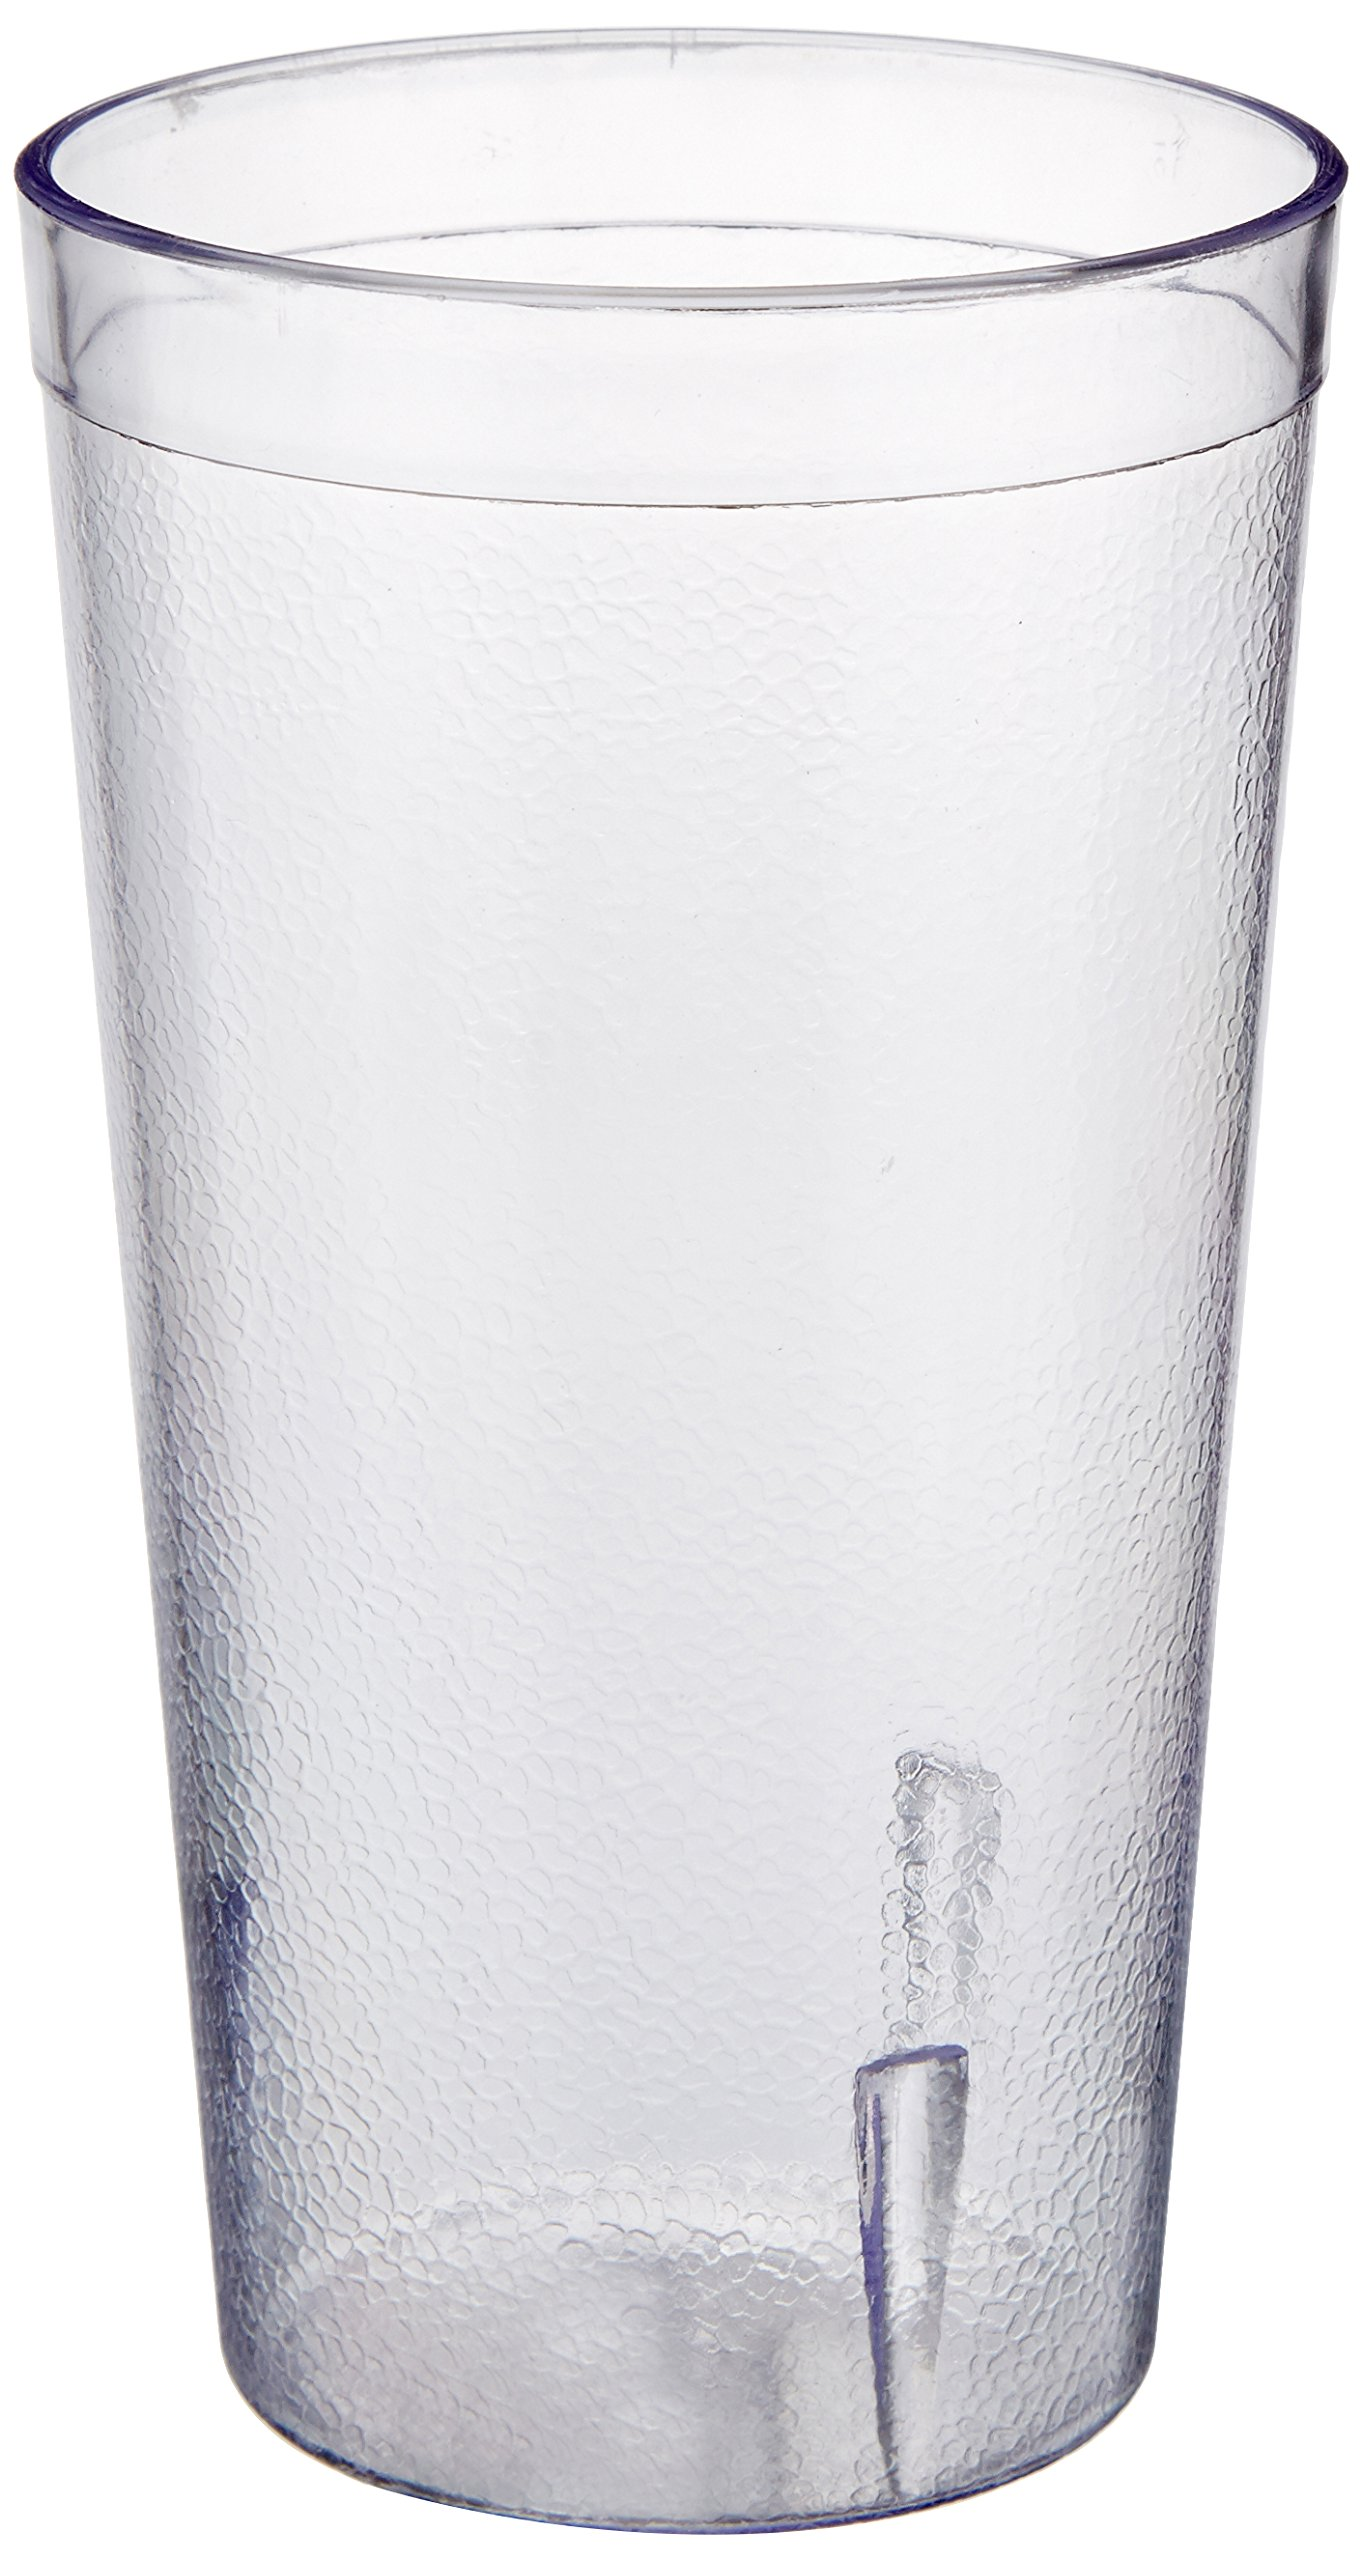 16 oz clear 12pk restaurant break resistant drinking glass cups plastic tumblers ebay. Black Bedroom Furniture Sets. Home Design Ideas